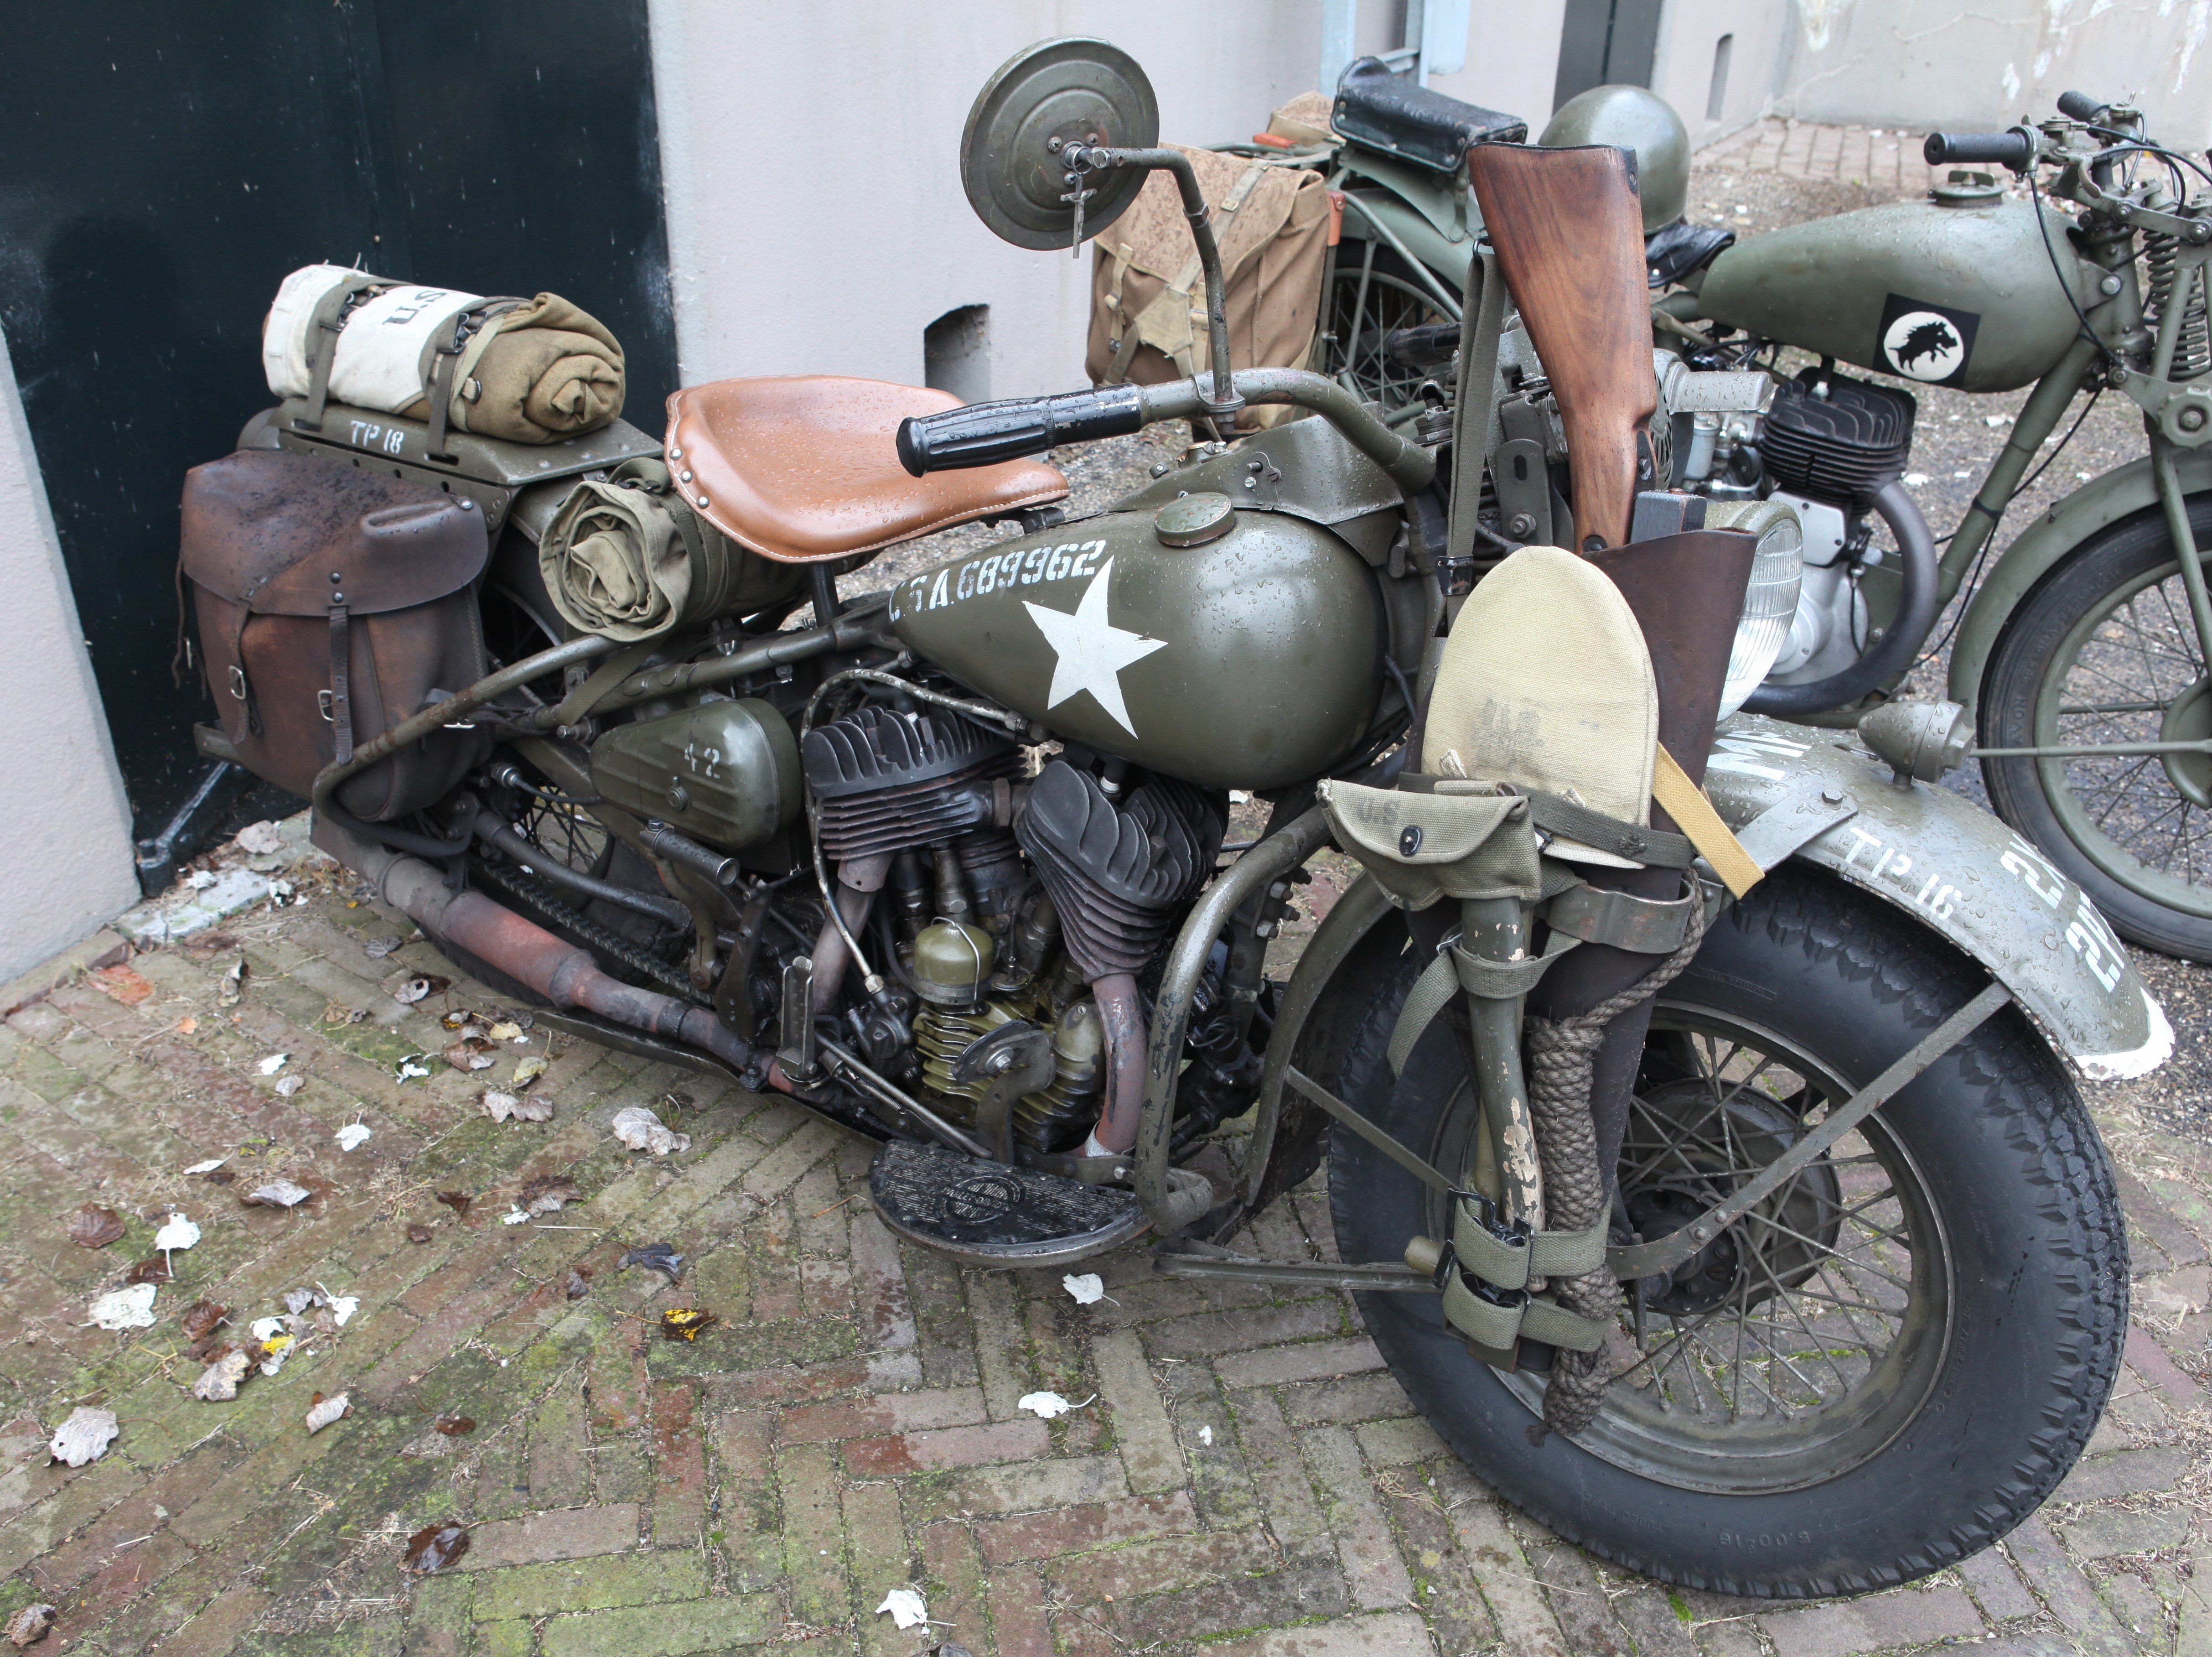 File:Harley Davidson WLA 45.jpg - Wikimedia Commons